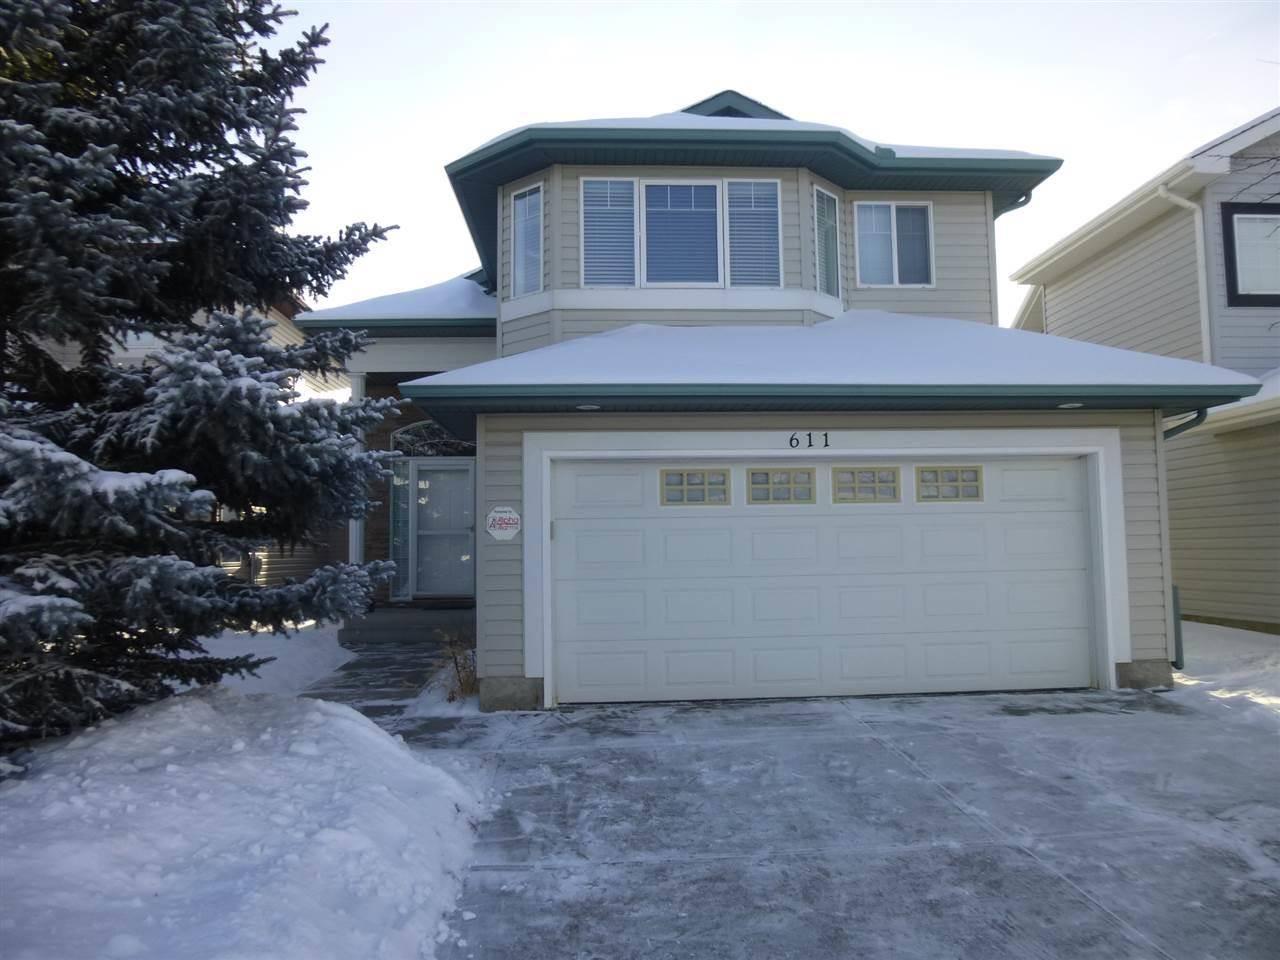 House for sale at 611 Beck Cs Sw Edmonton Alberta - MLS: E4186420